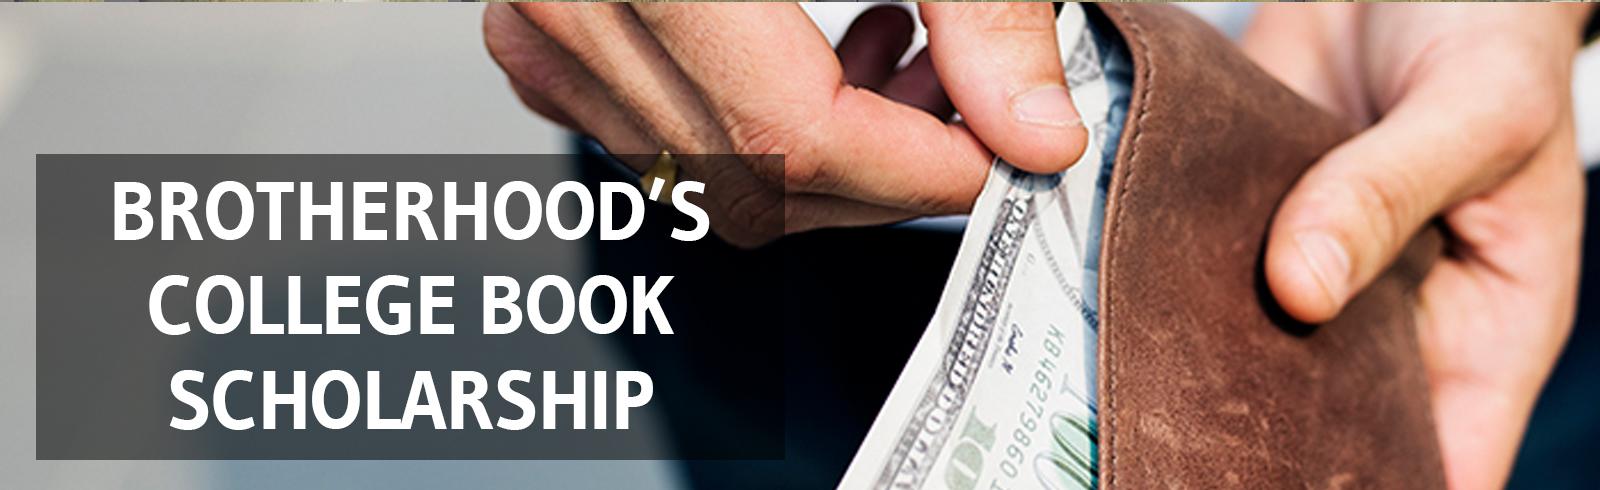 slider-brotherhood-scholarship